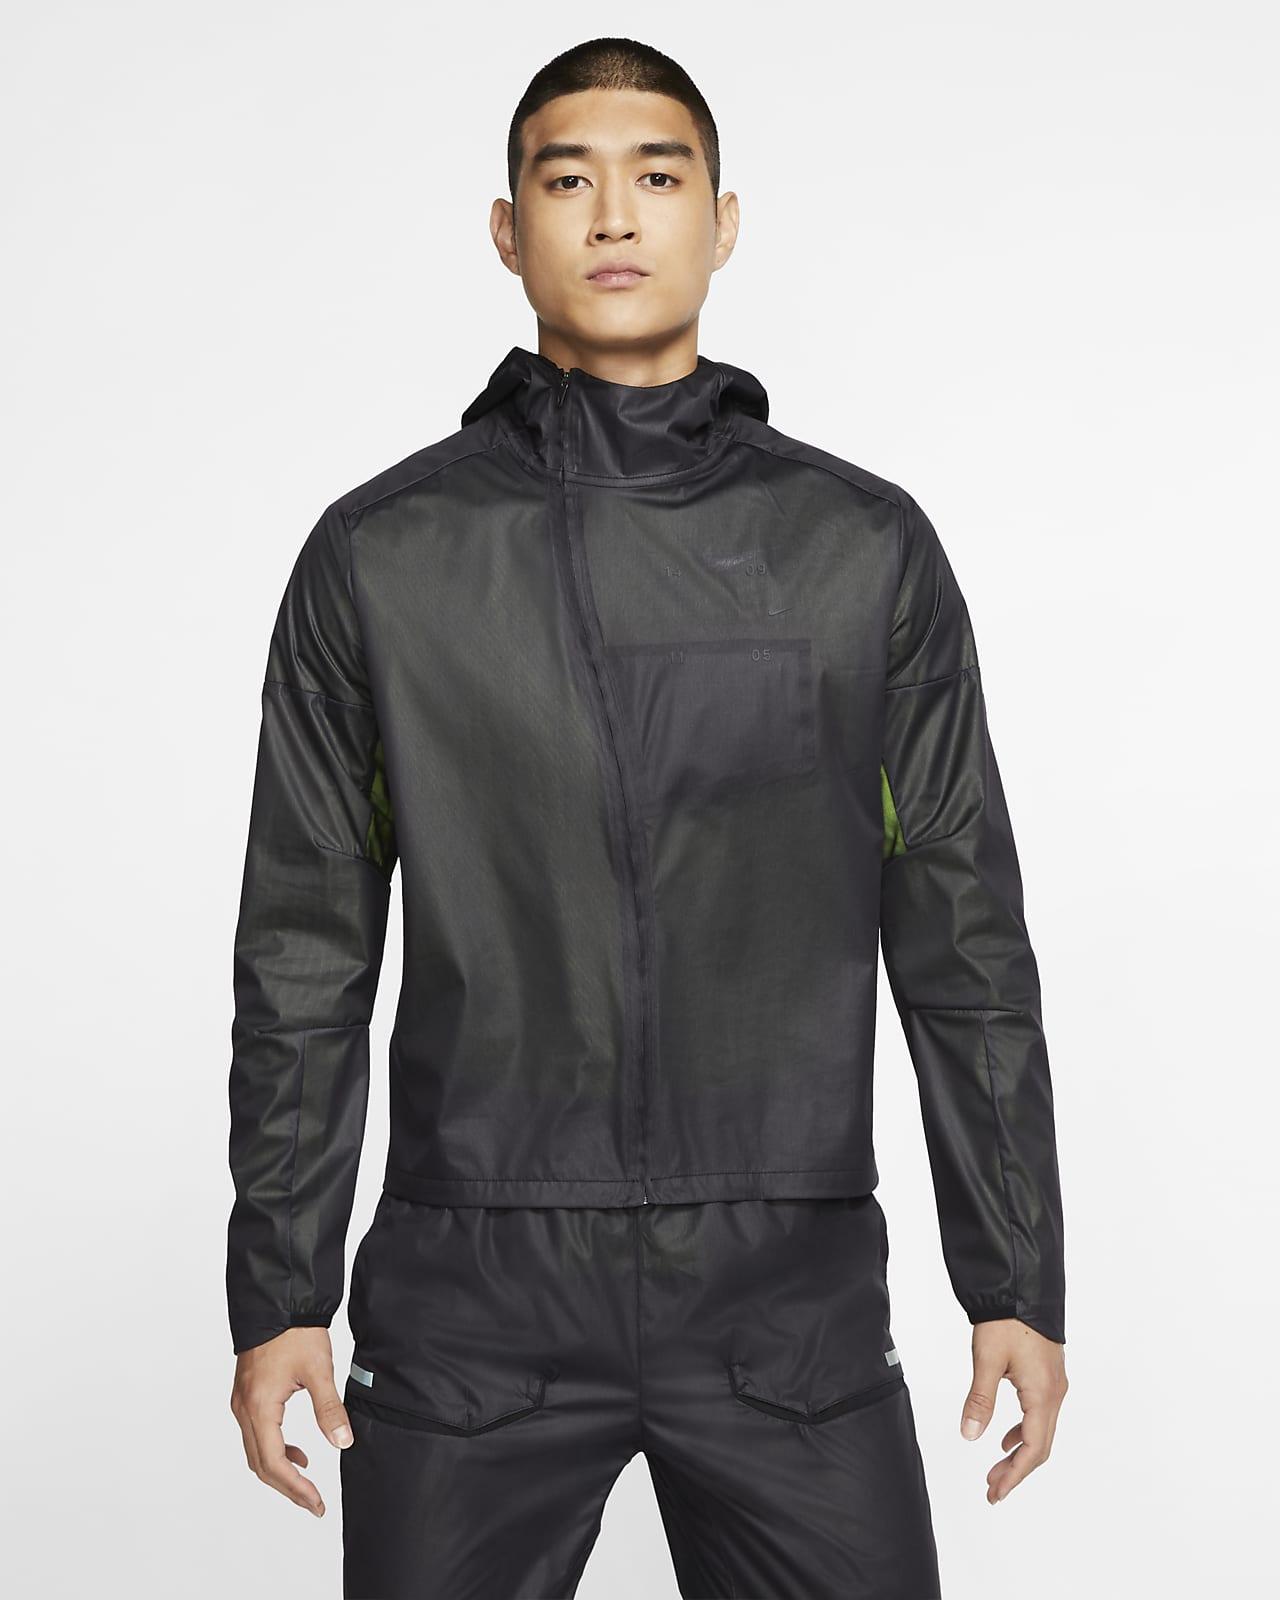 Nike Tech Pack Men's 3-Layer Running Jacket